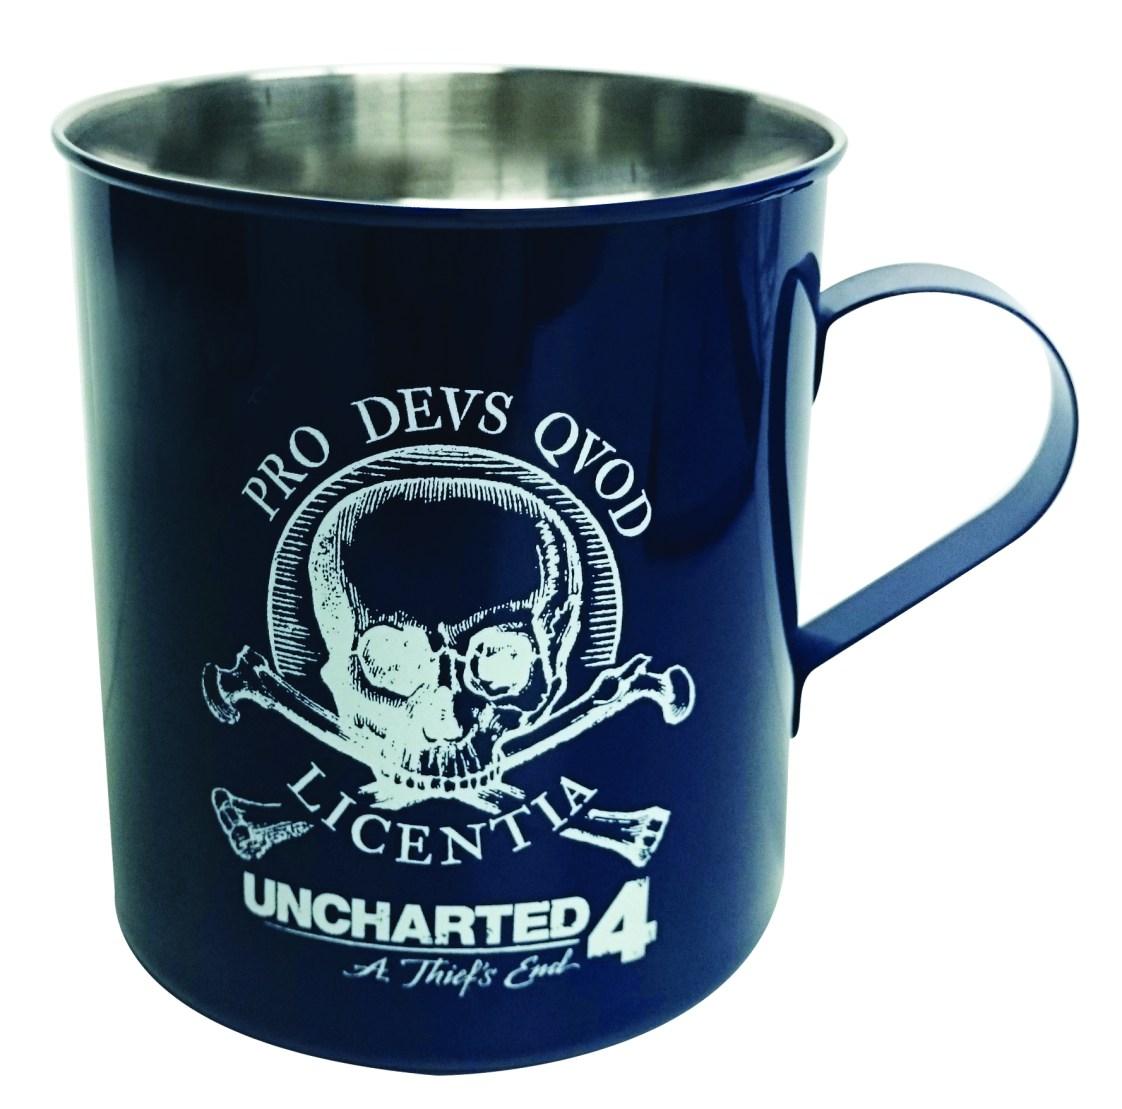 Uncharted4_steelmug_final_v2